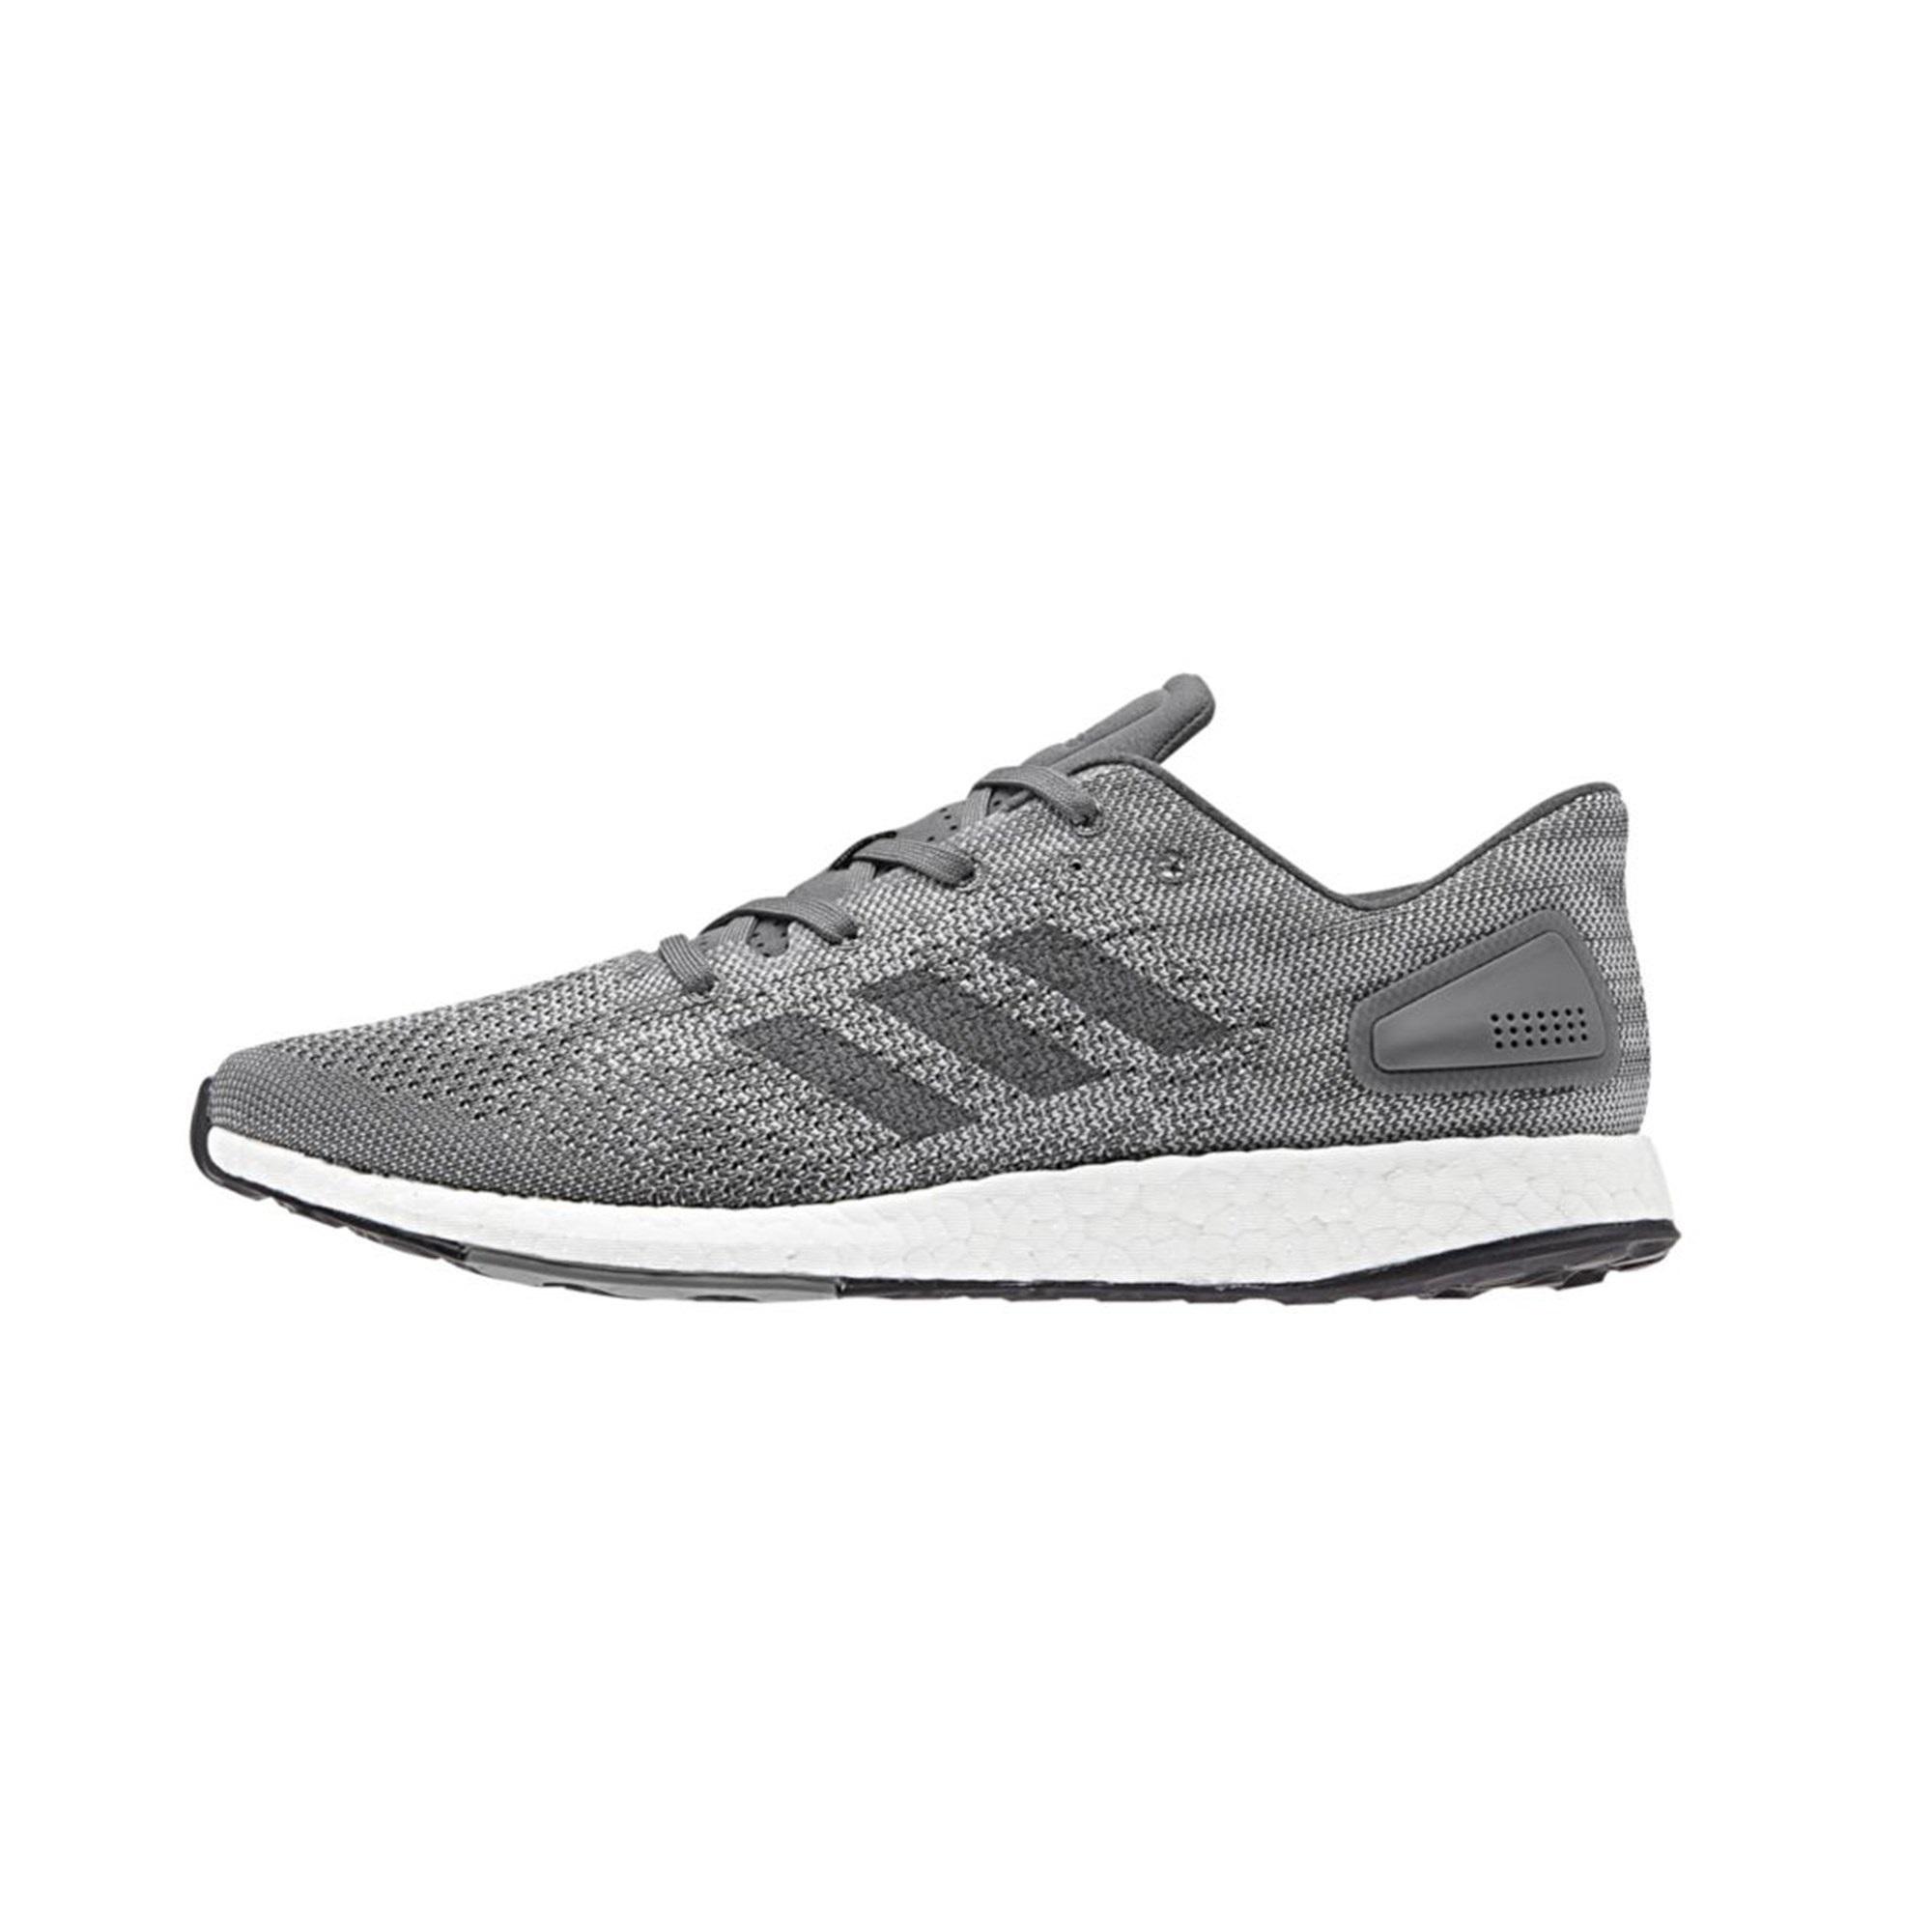 کفش مخصوص دویدن مردانه آدیداس مدل pure boost DPR کد  bb6290